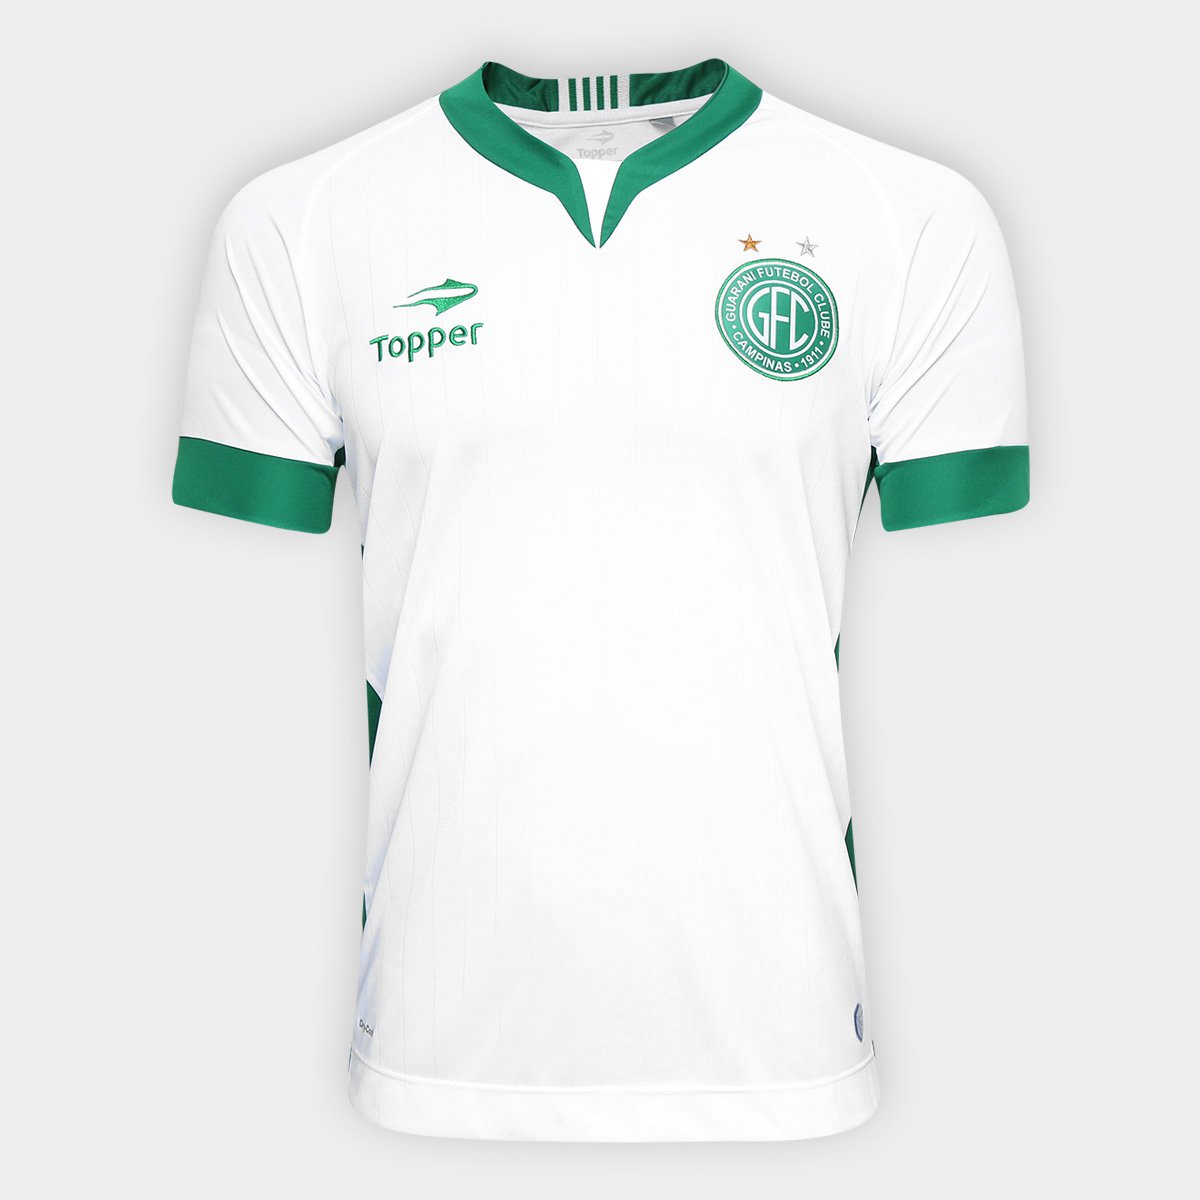 Camisa Guarani II 17 18 s n° - Torcedor Topper Masculina - Compre Agora  82c175e233bc7